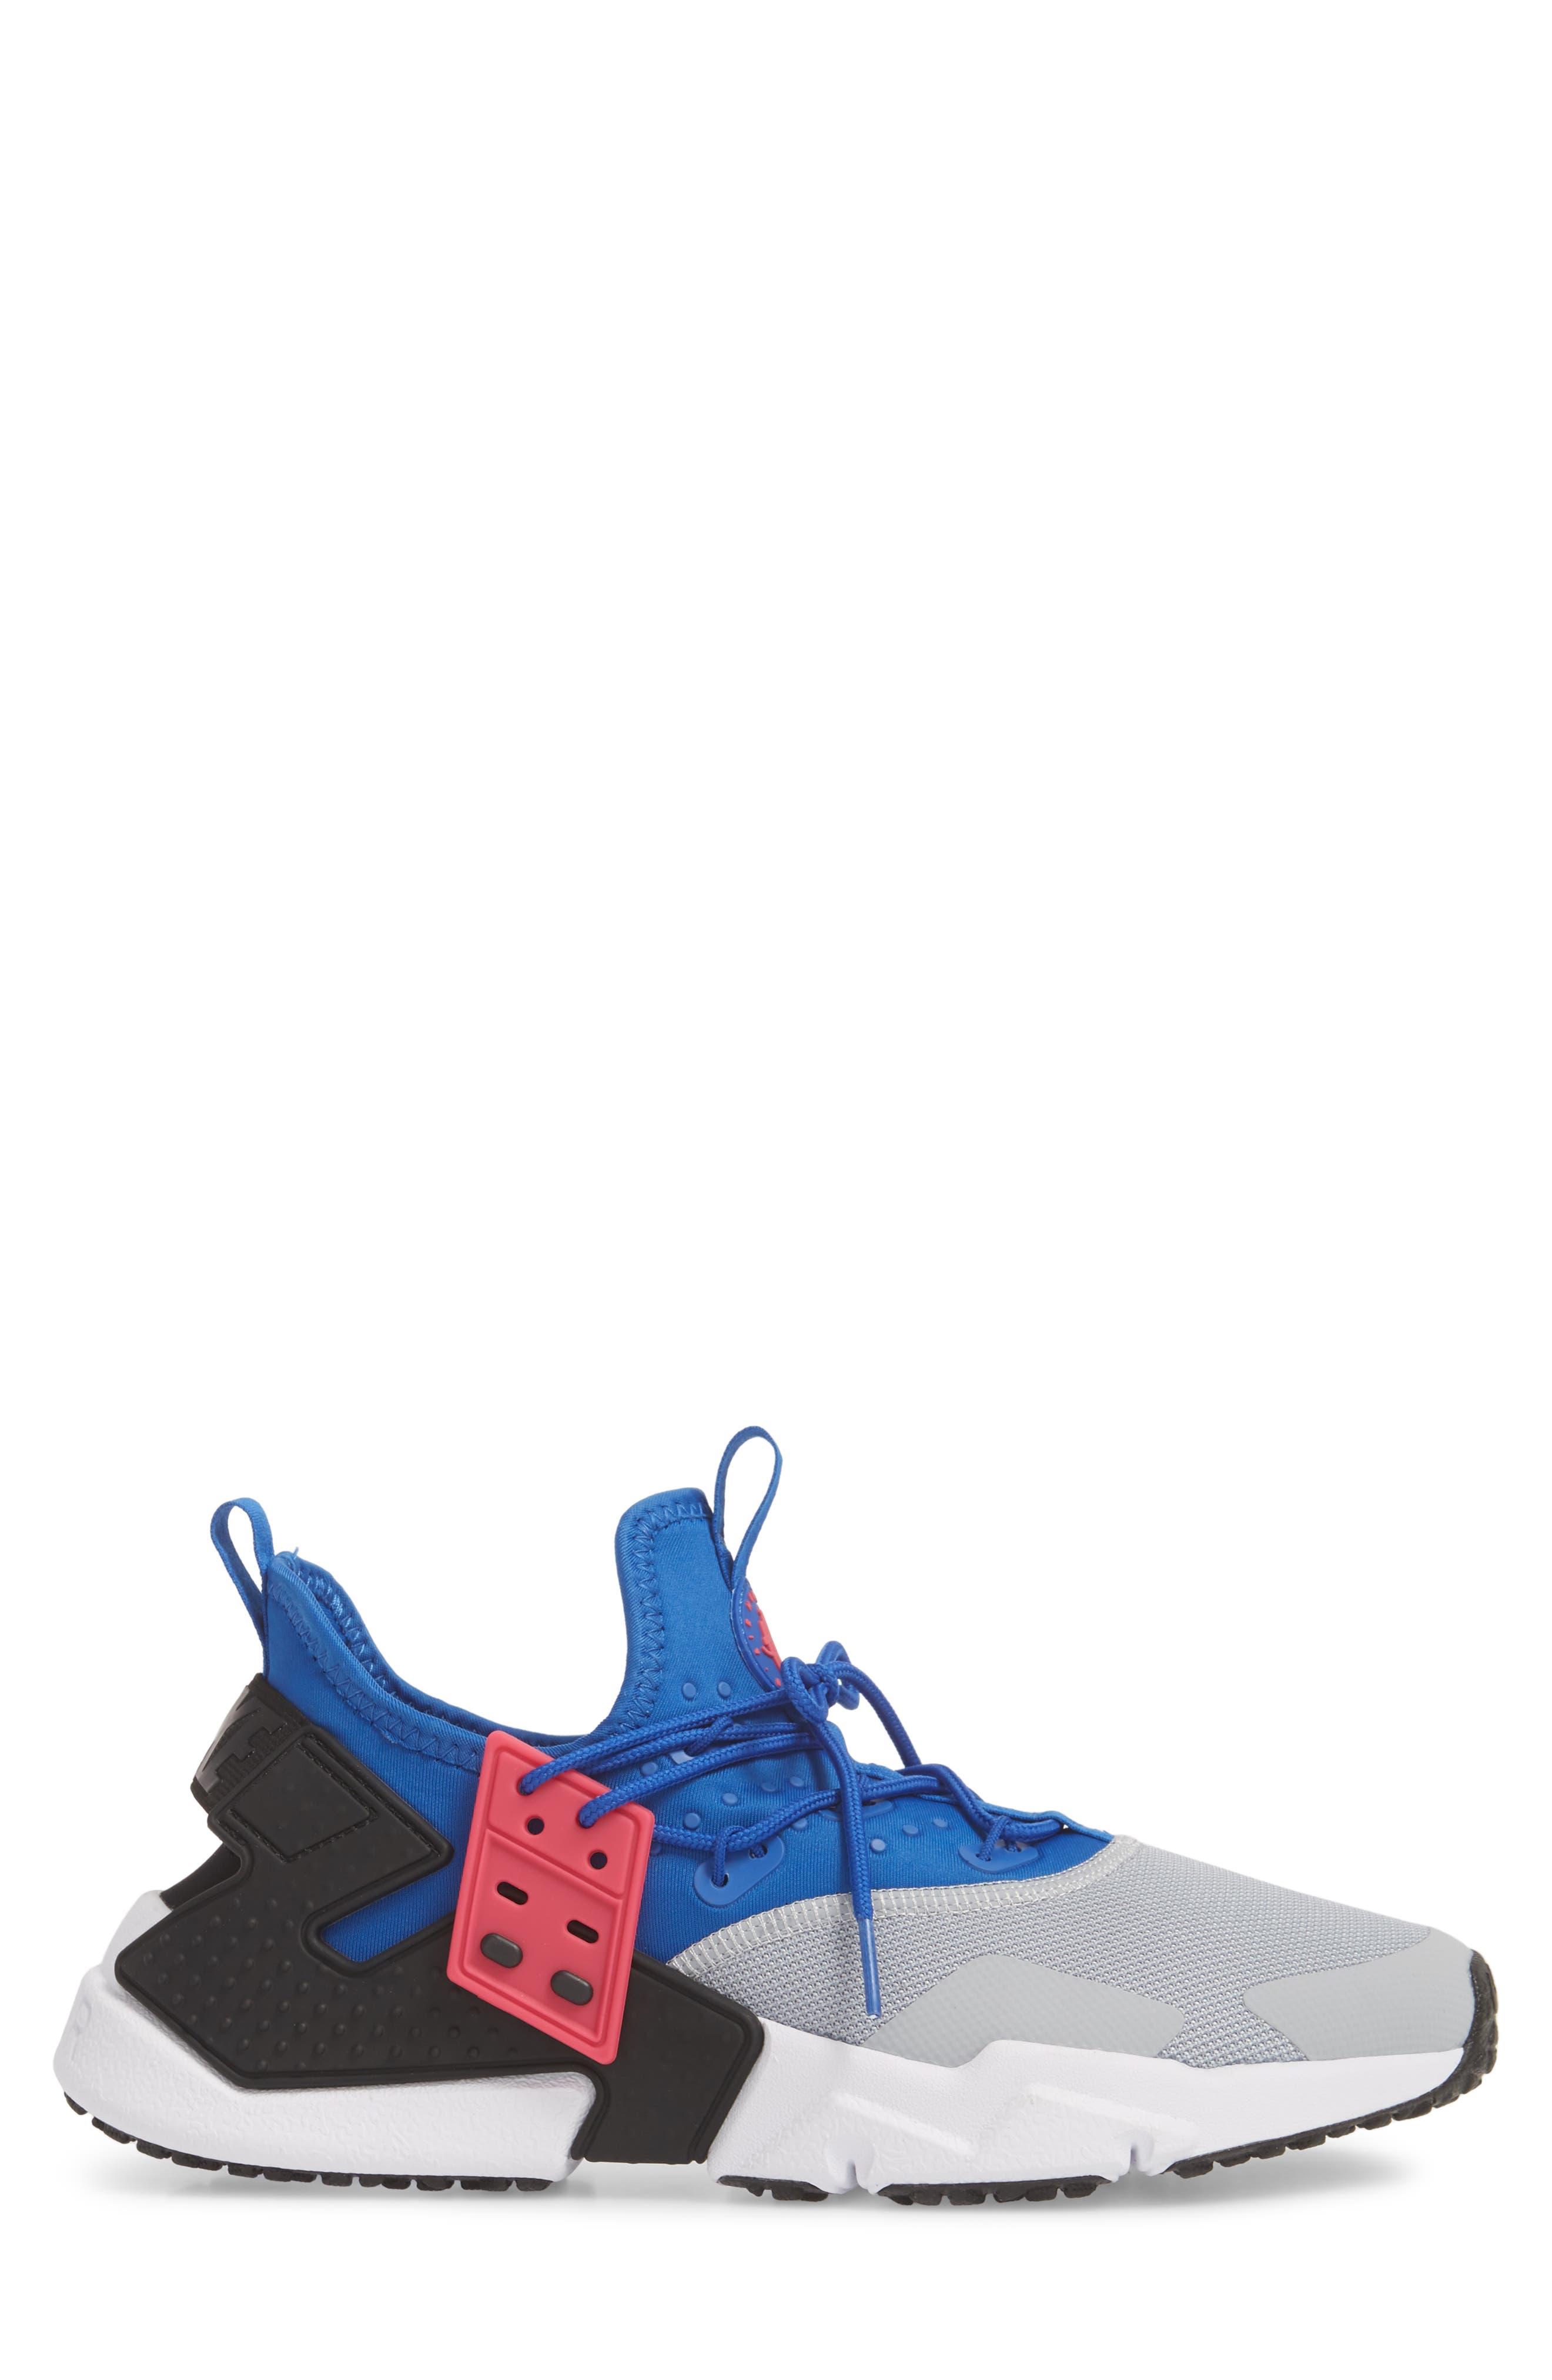 Air Huarache Drift Sneaker,                             Alternate thumbnail 3, color,                             Game Royal/ White/ Wolf Grey